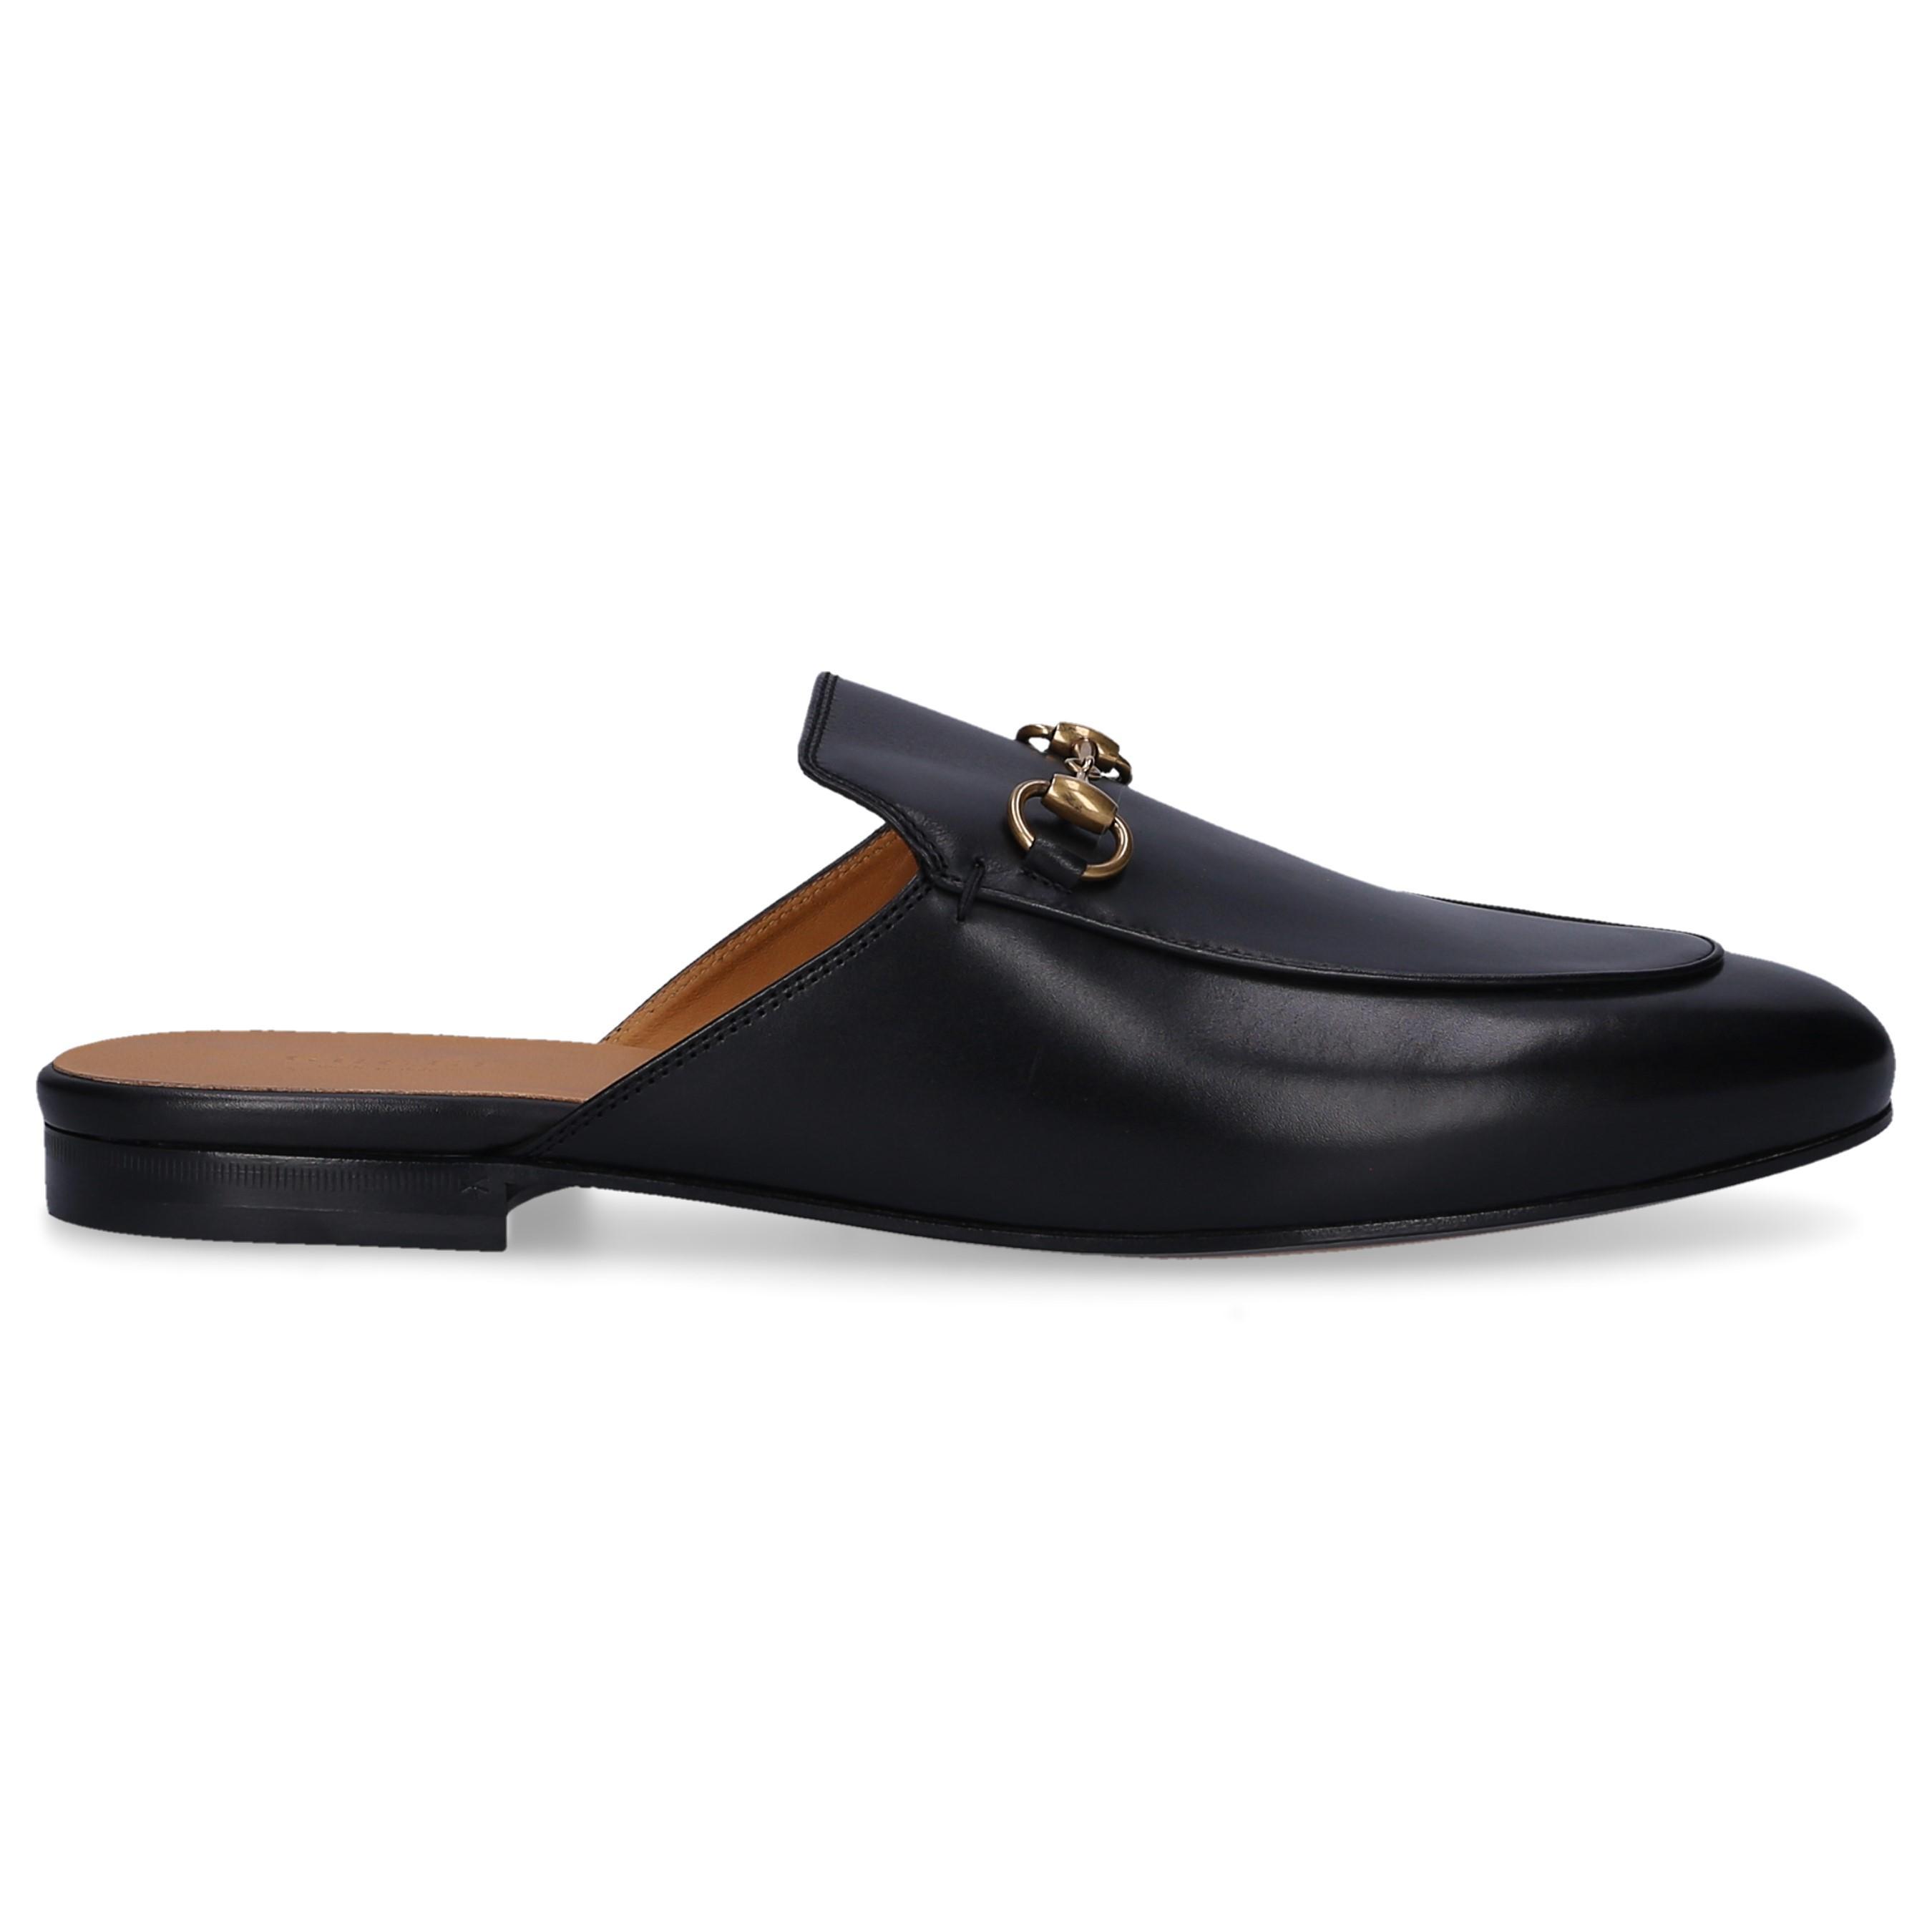 8aed33340cb Lyst - Gucci Slip On Shoes Princetown Calfskin Horsebit-detail Black ...